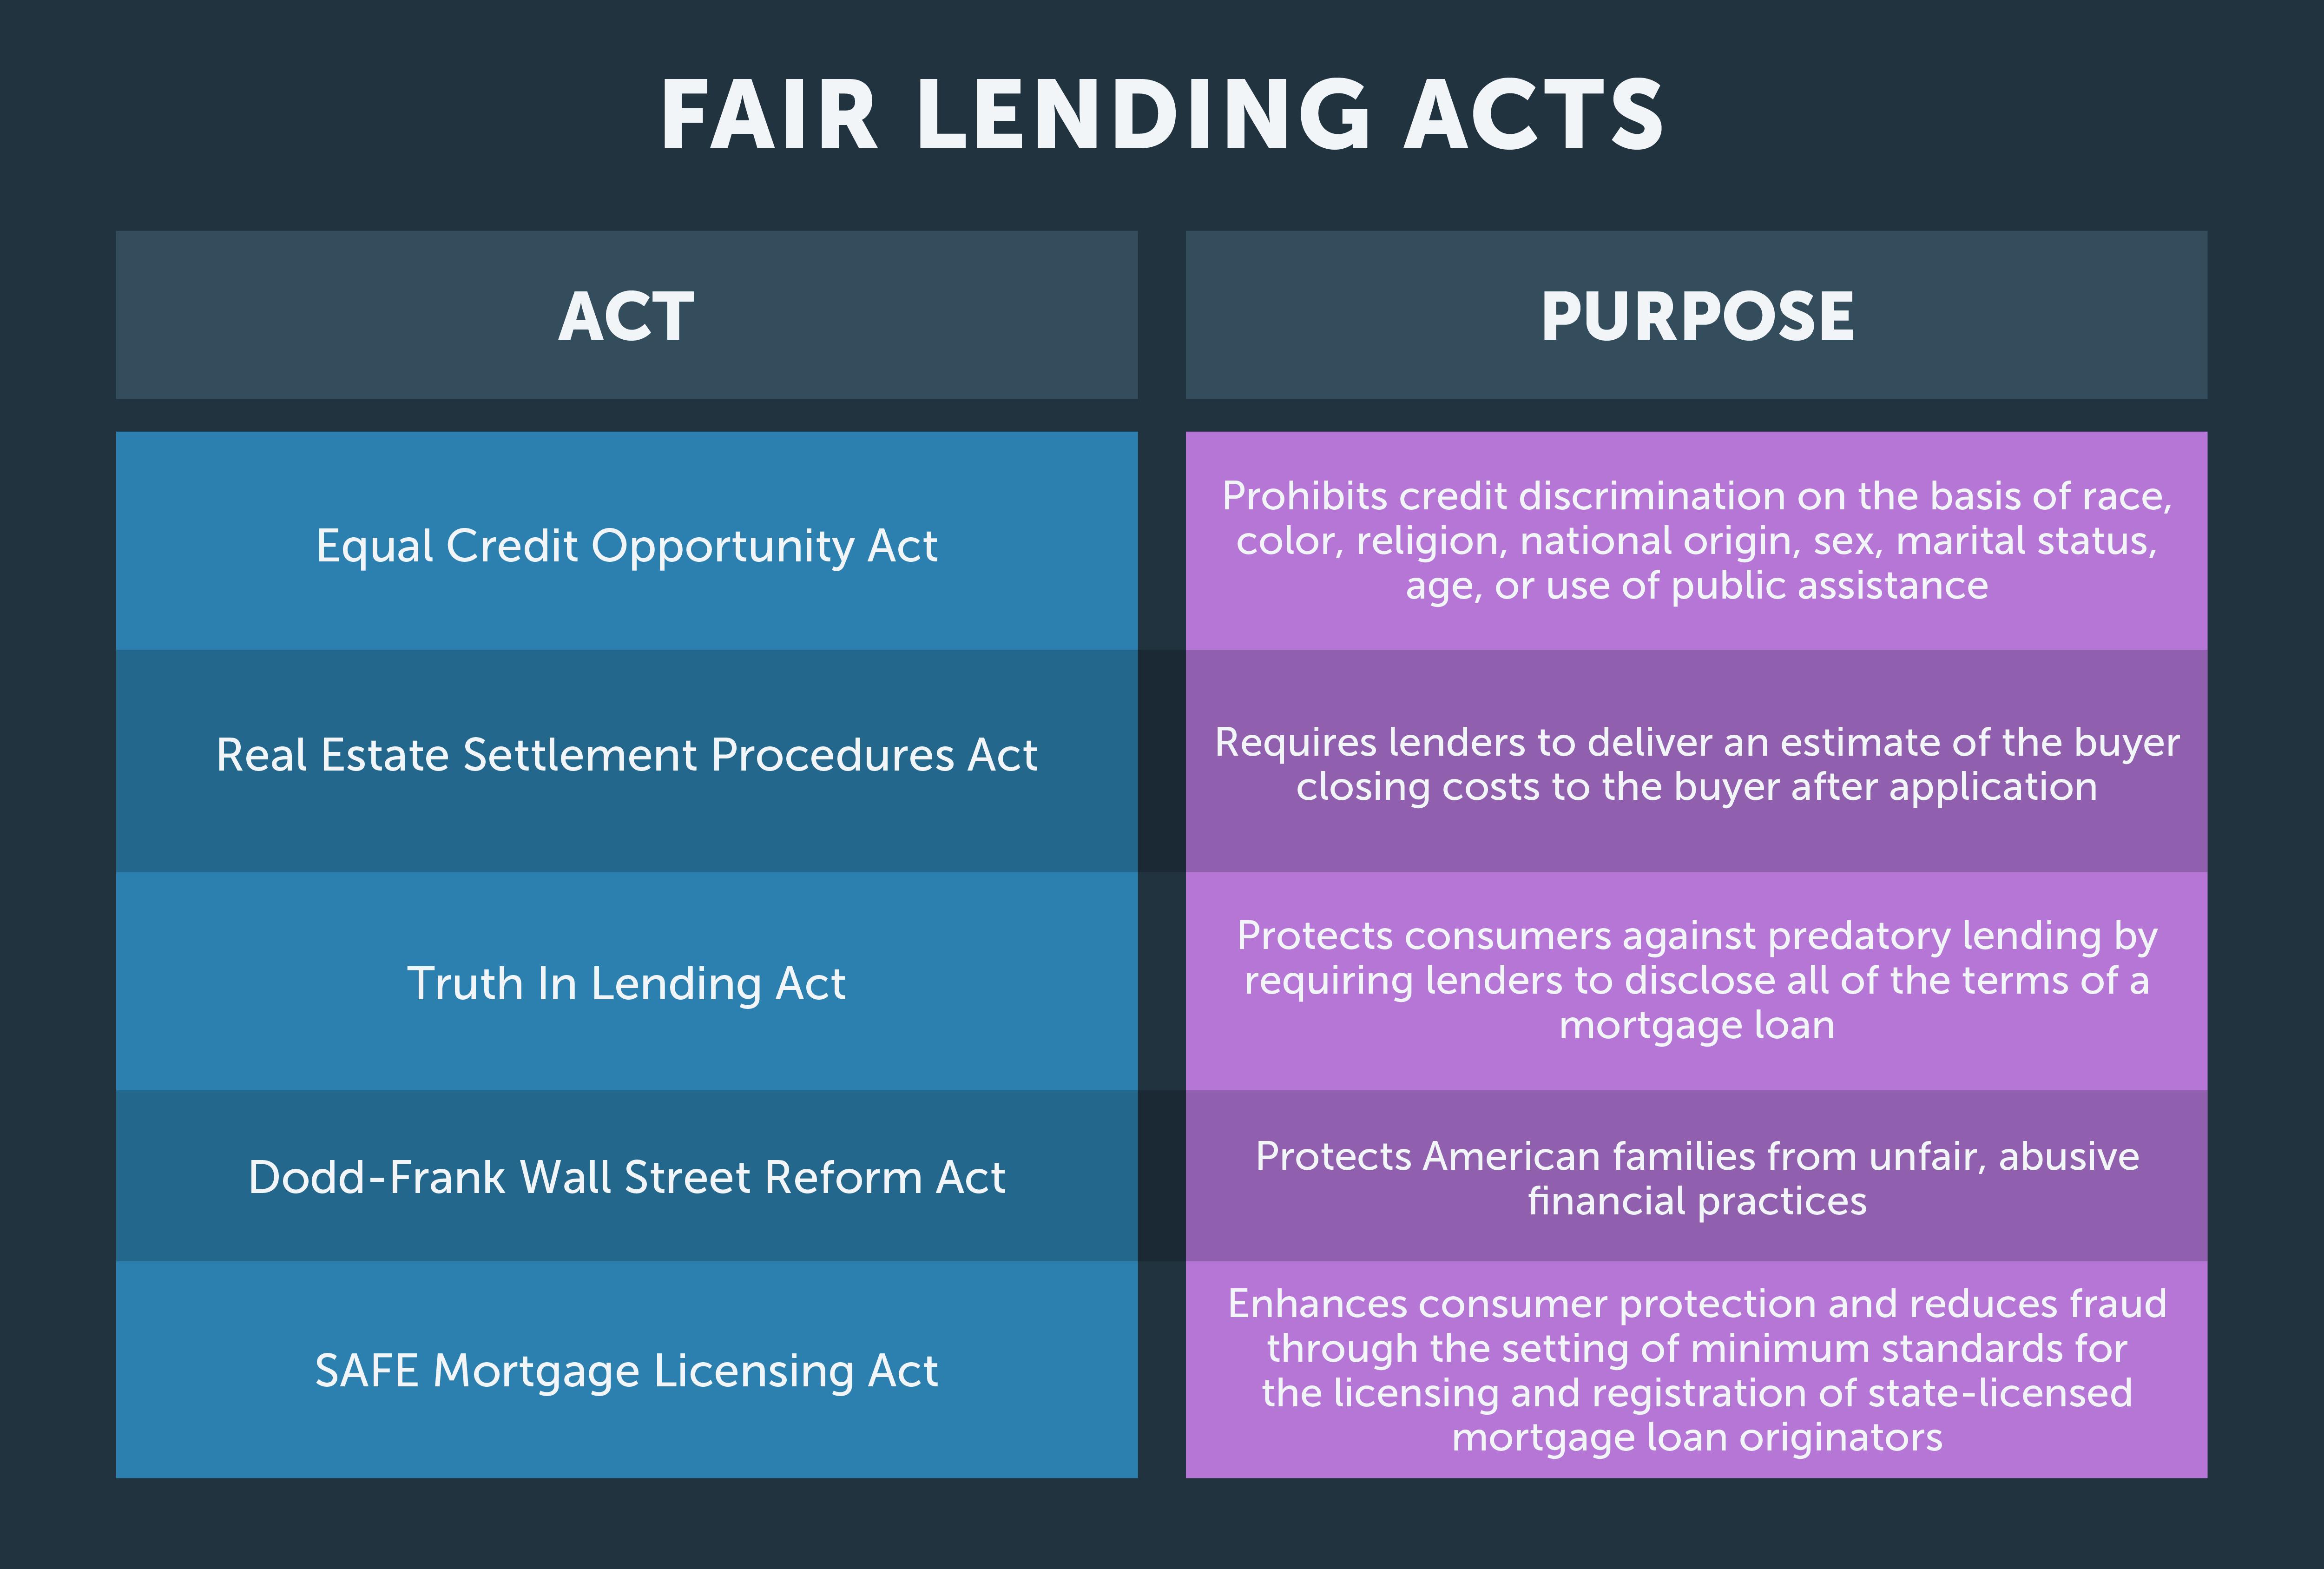 texas fair lending acts by aceable